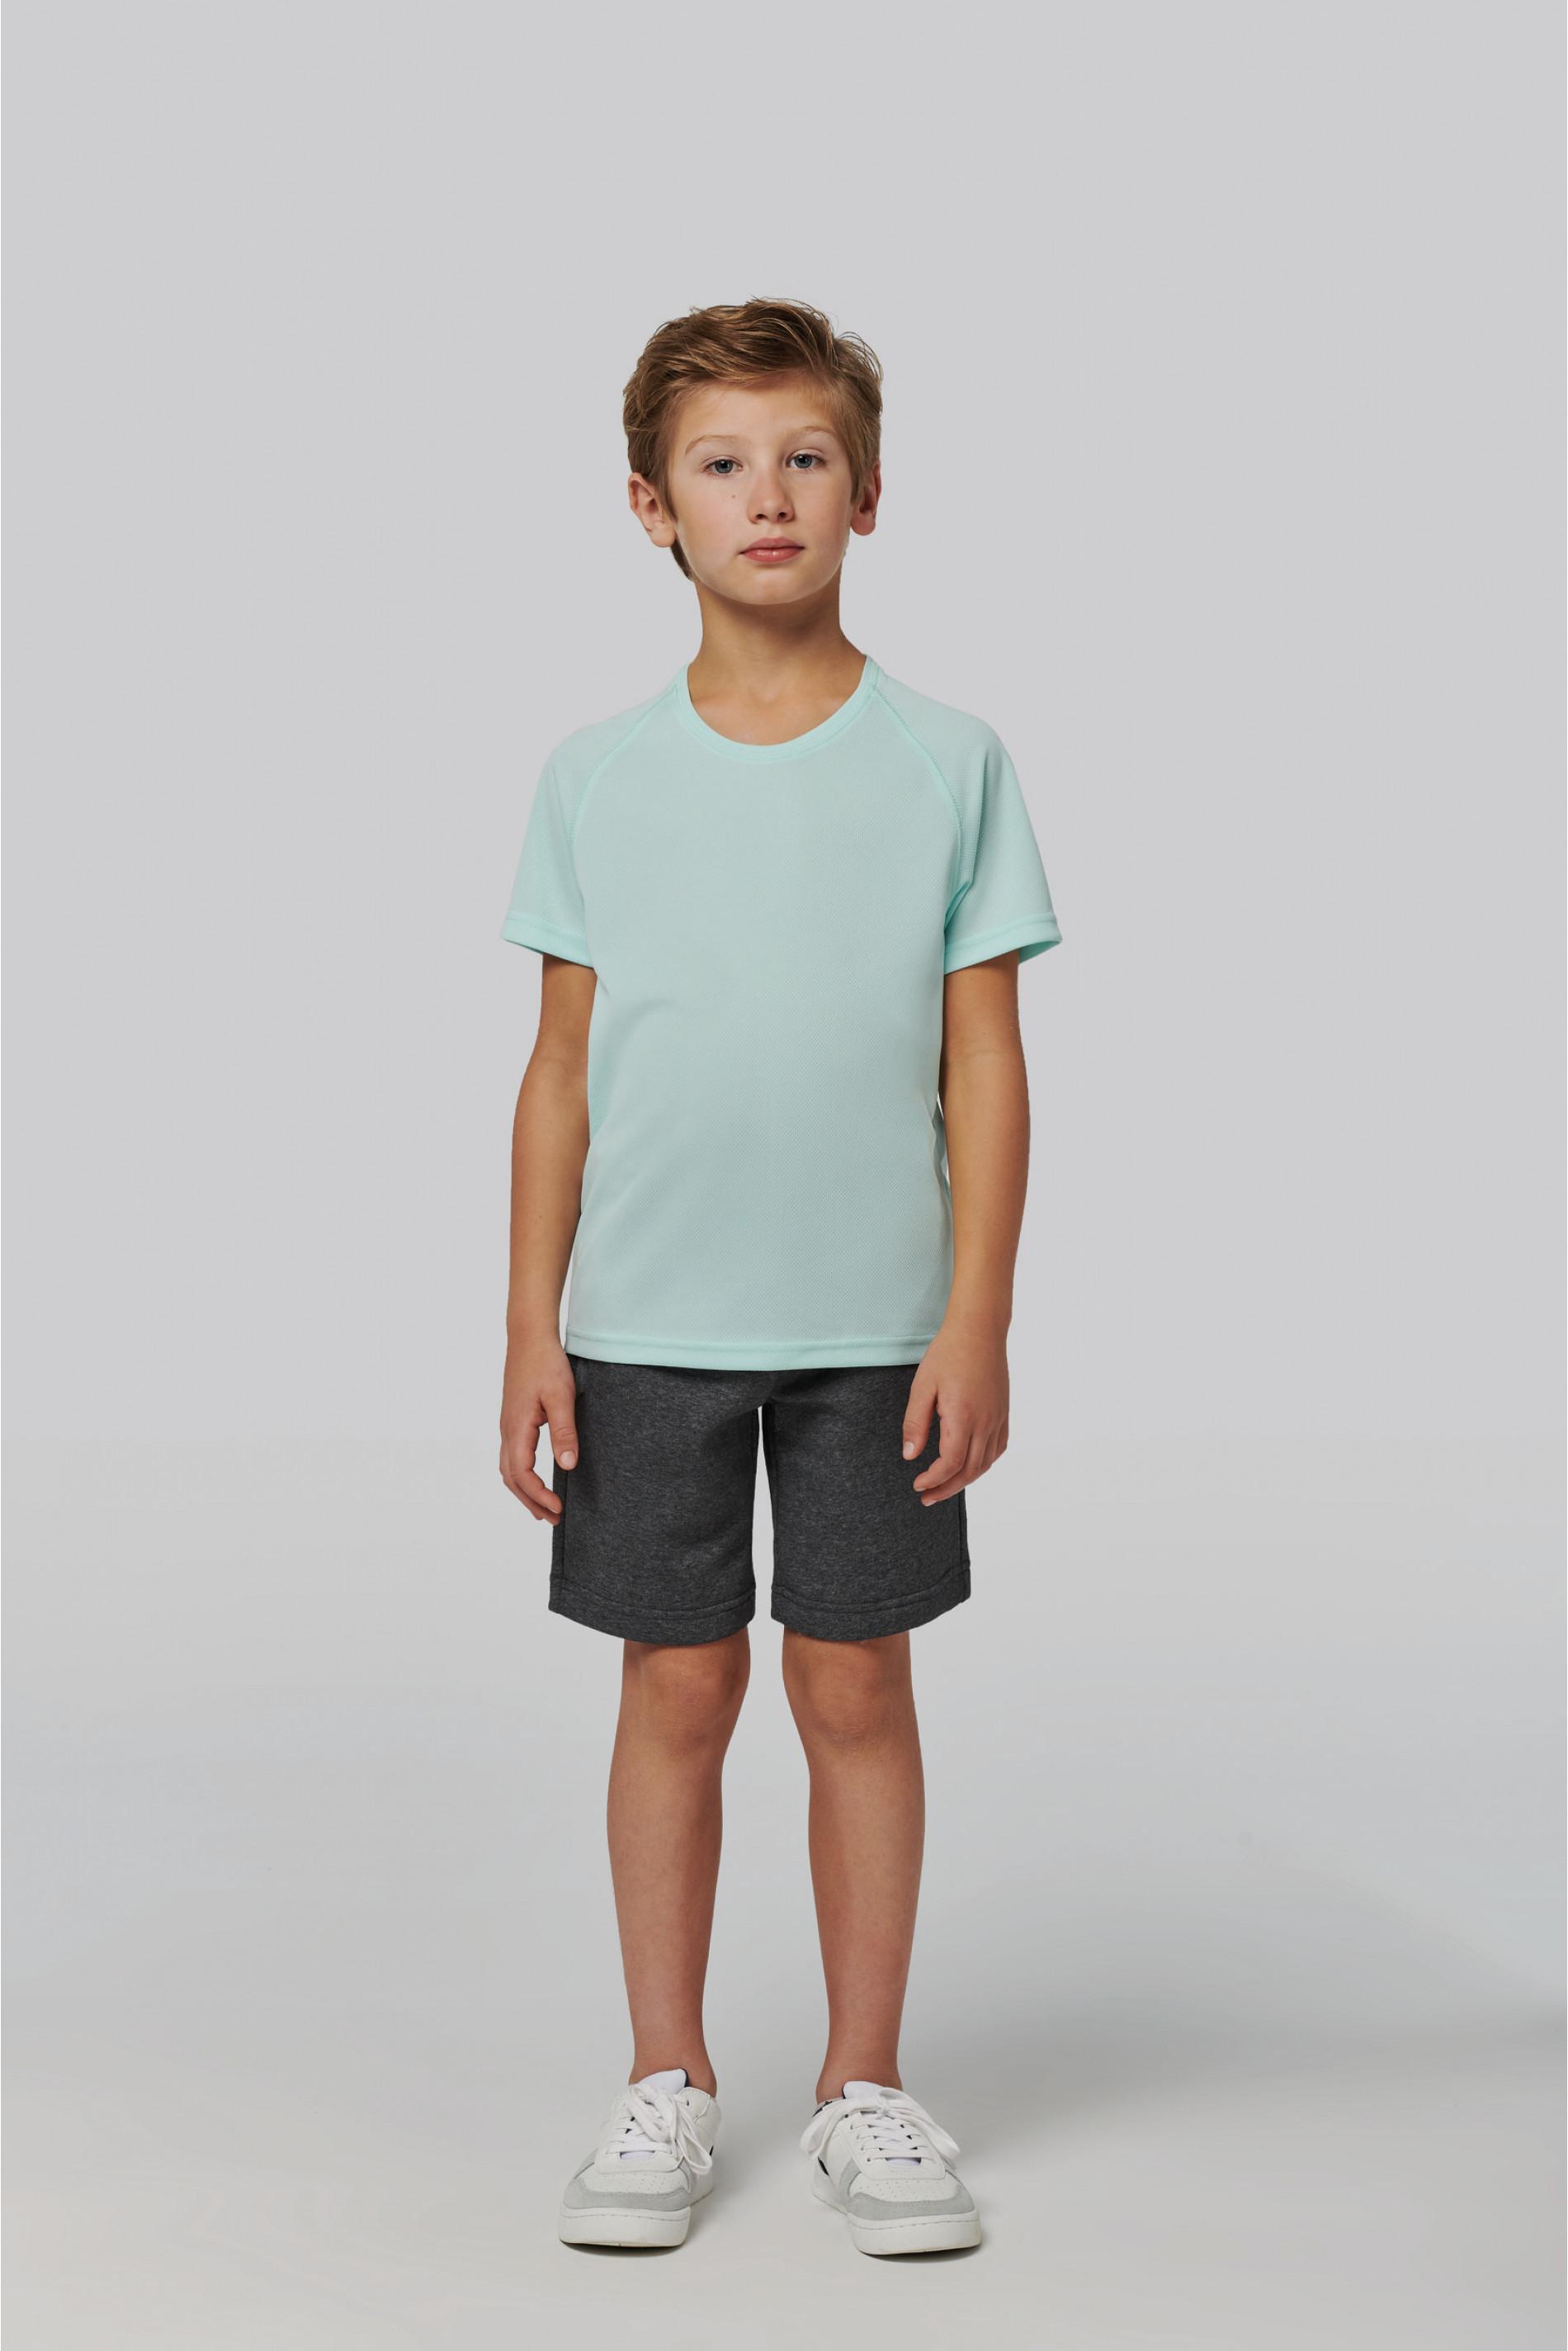 Tee-shirt sport manches courtes enfant